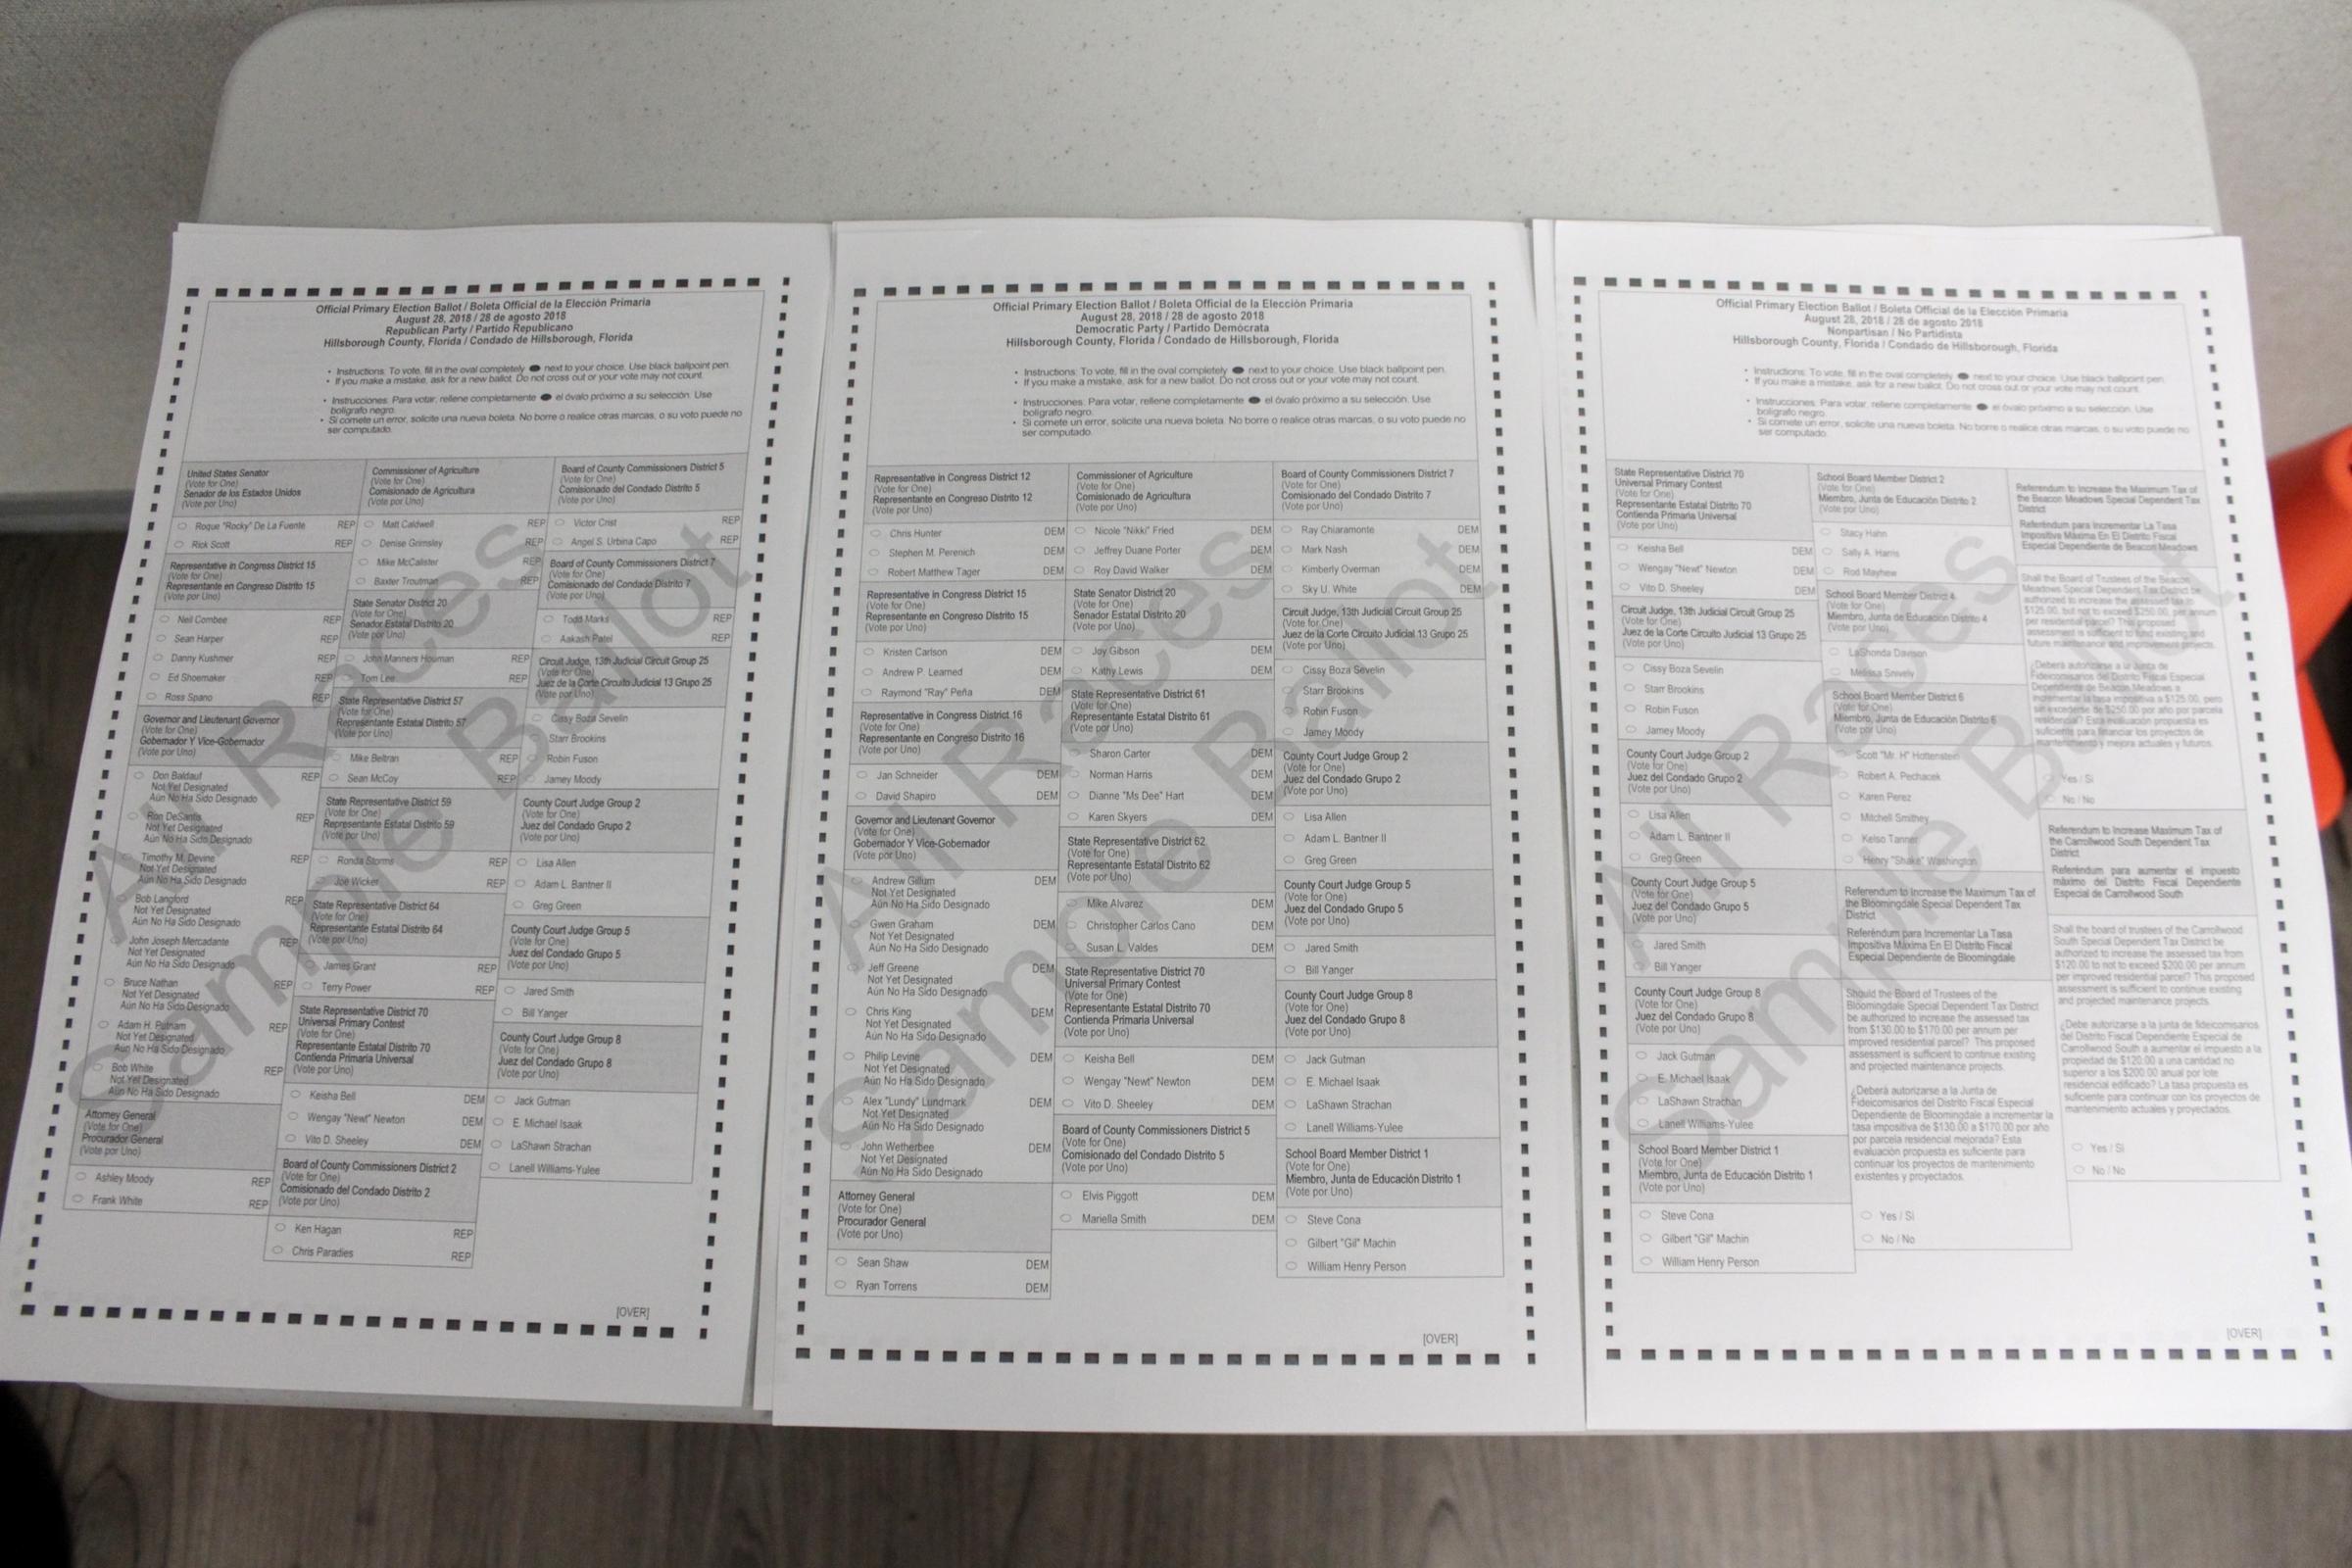 Okaloosa county sample ballot general election november 6, 2018.